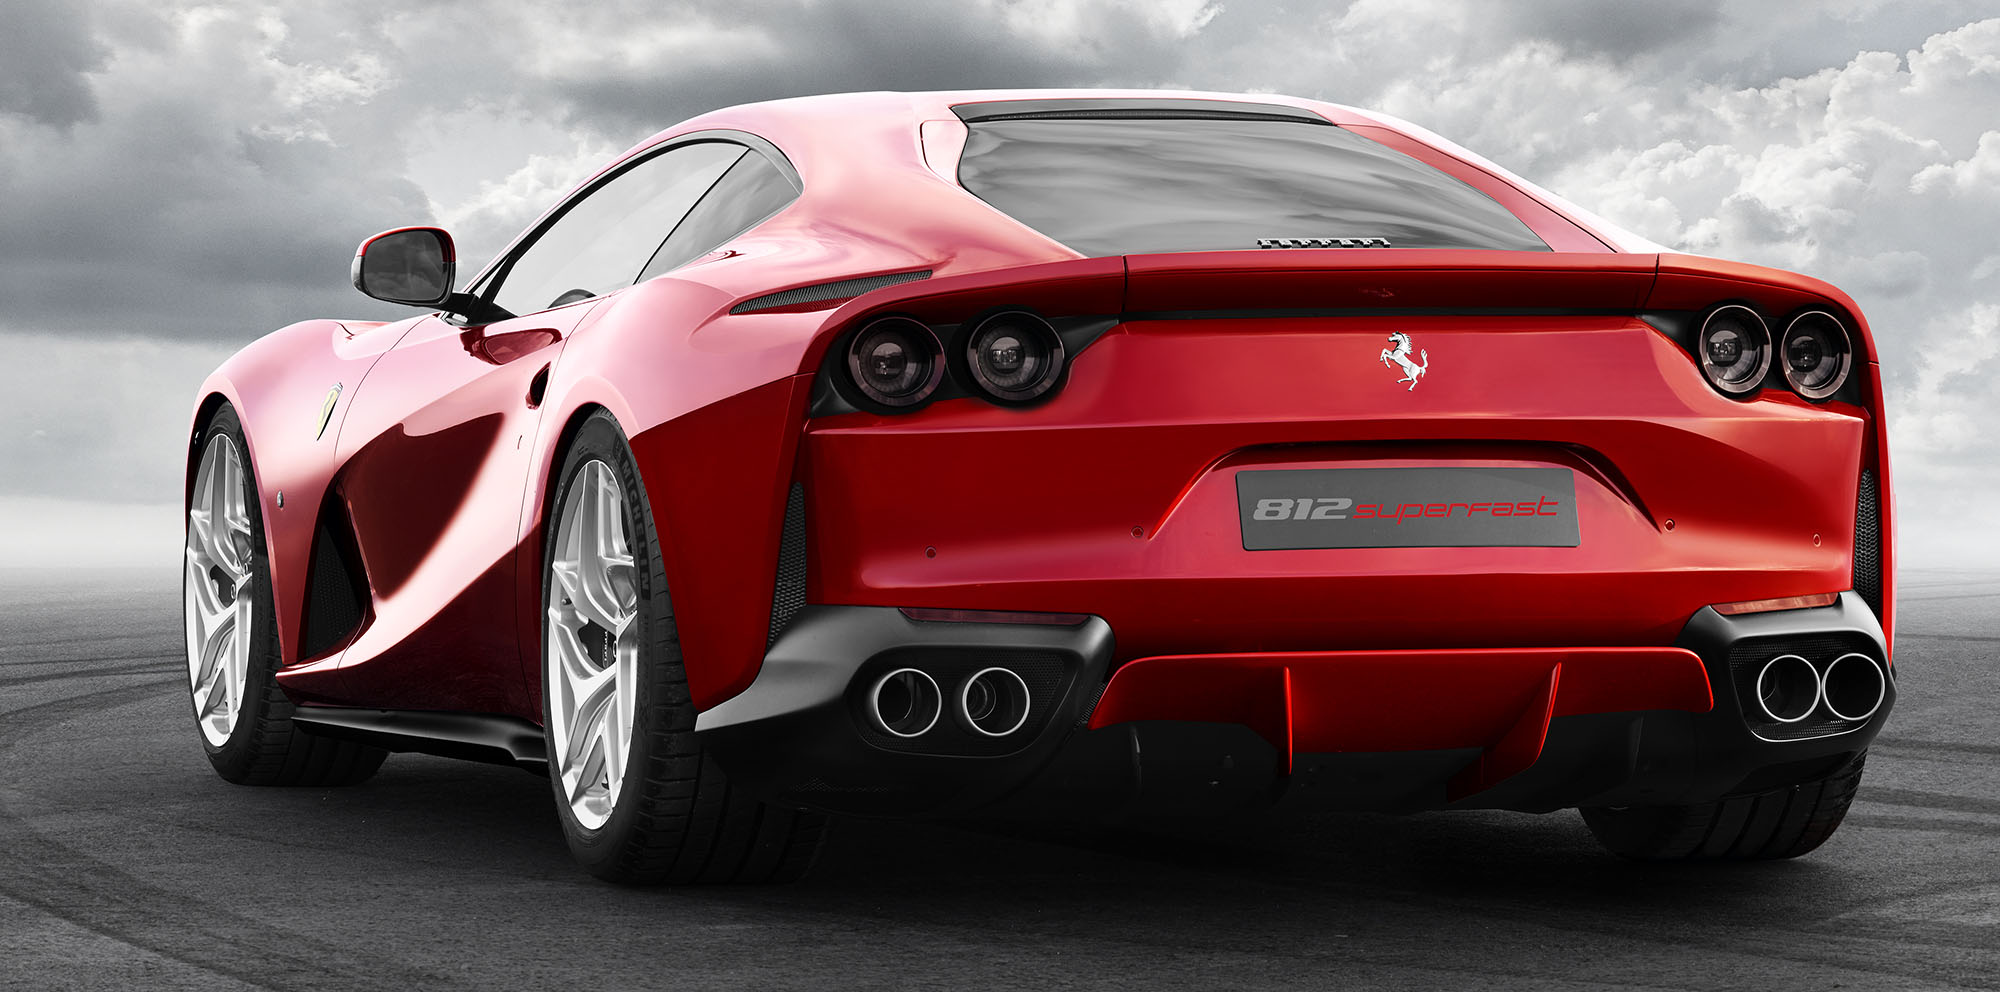 2017 Ferrari 812 Superfast revealed - Photos (1 of 6)